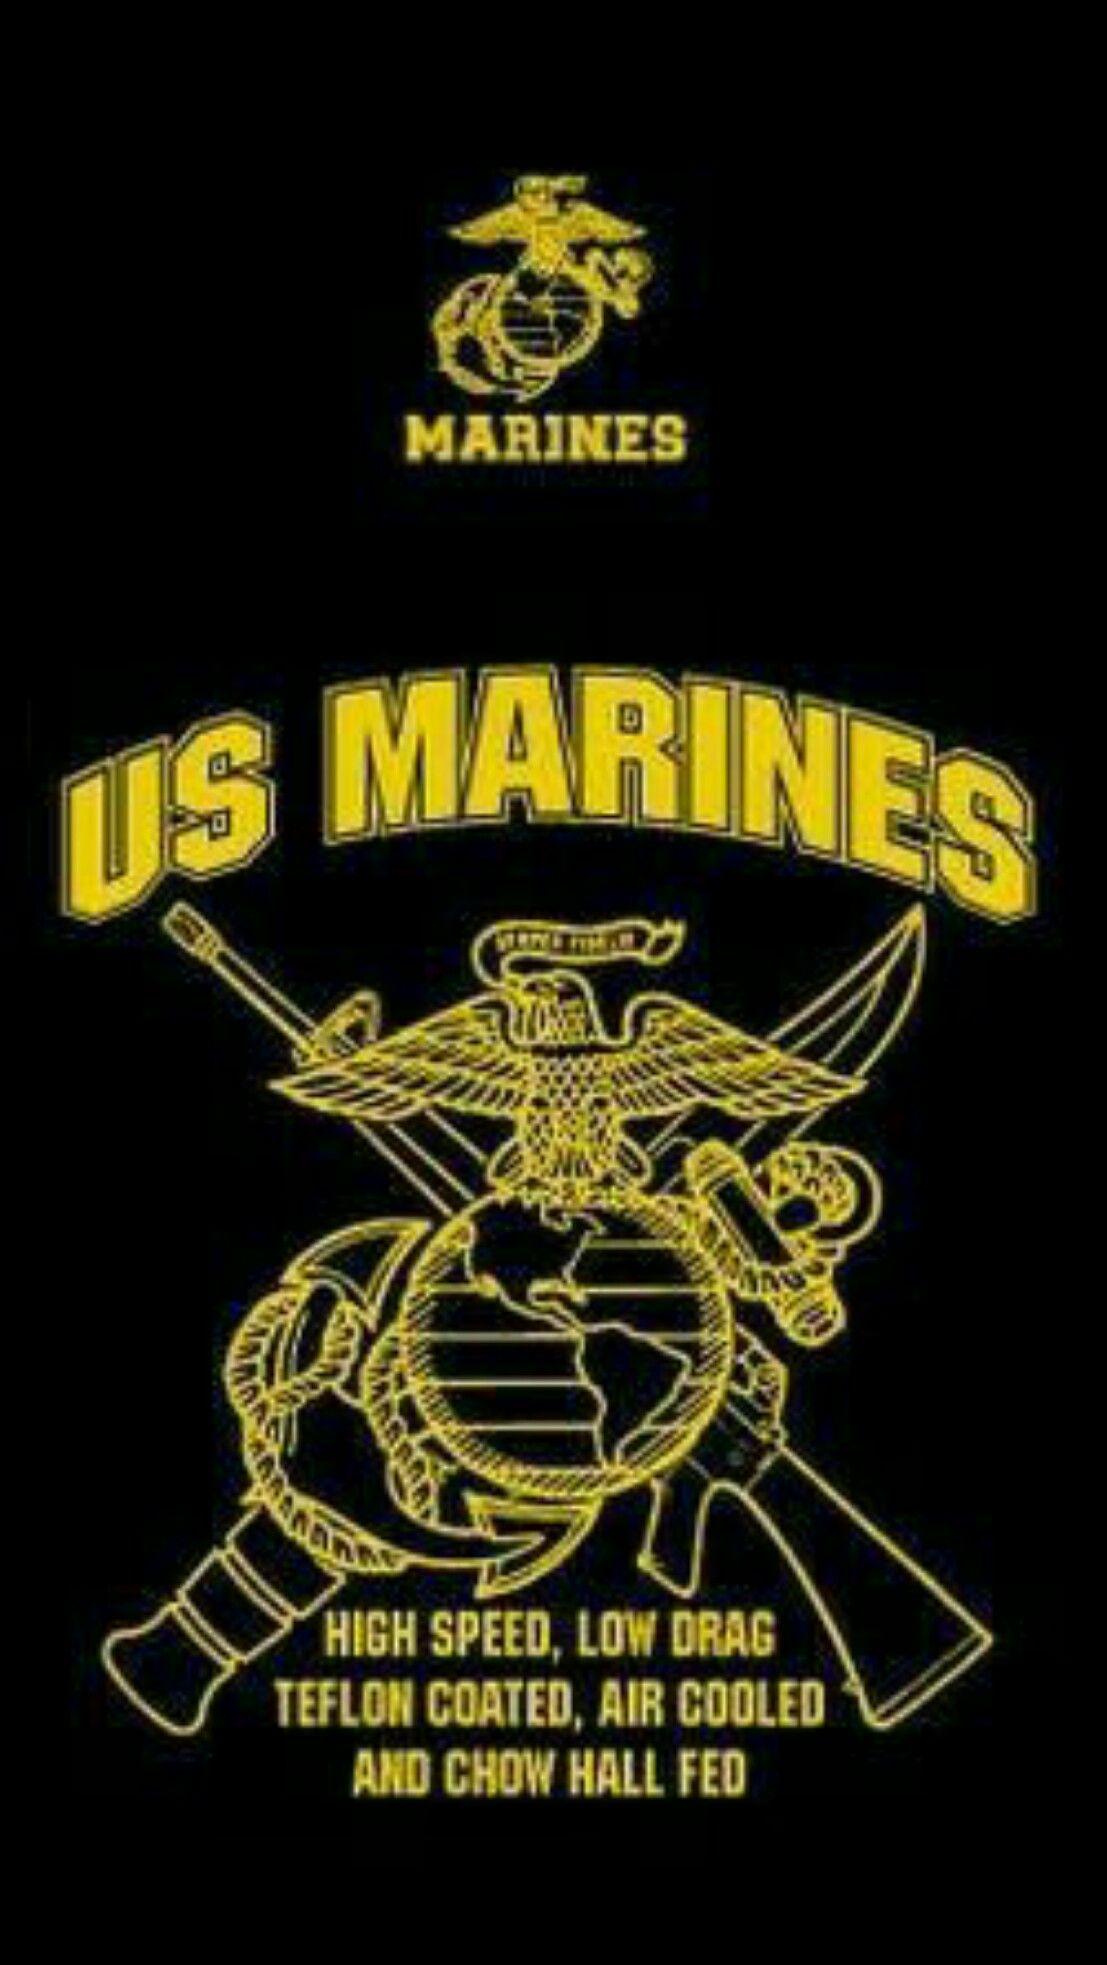 Marines Usa Black Wallpaper Android Iphone Marine Corps Usmc Military Marines